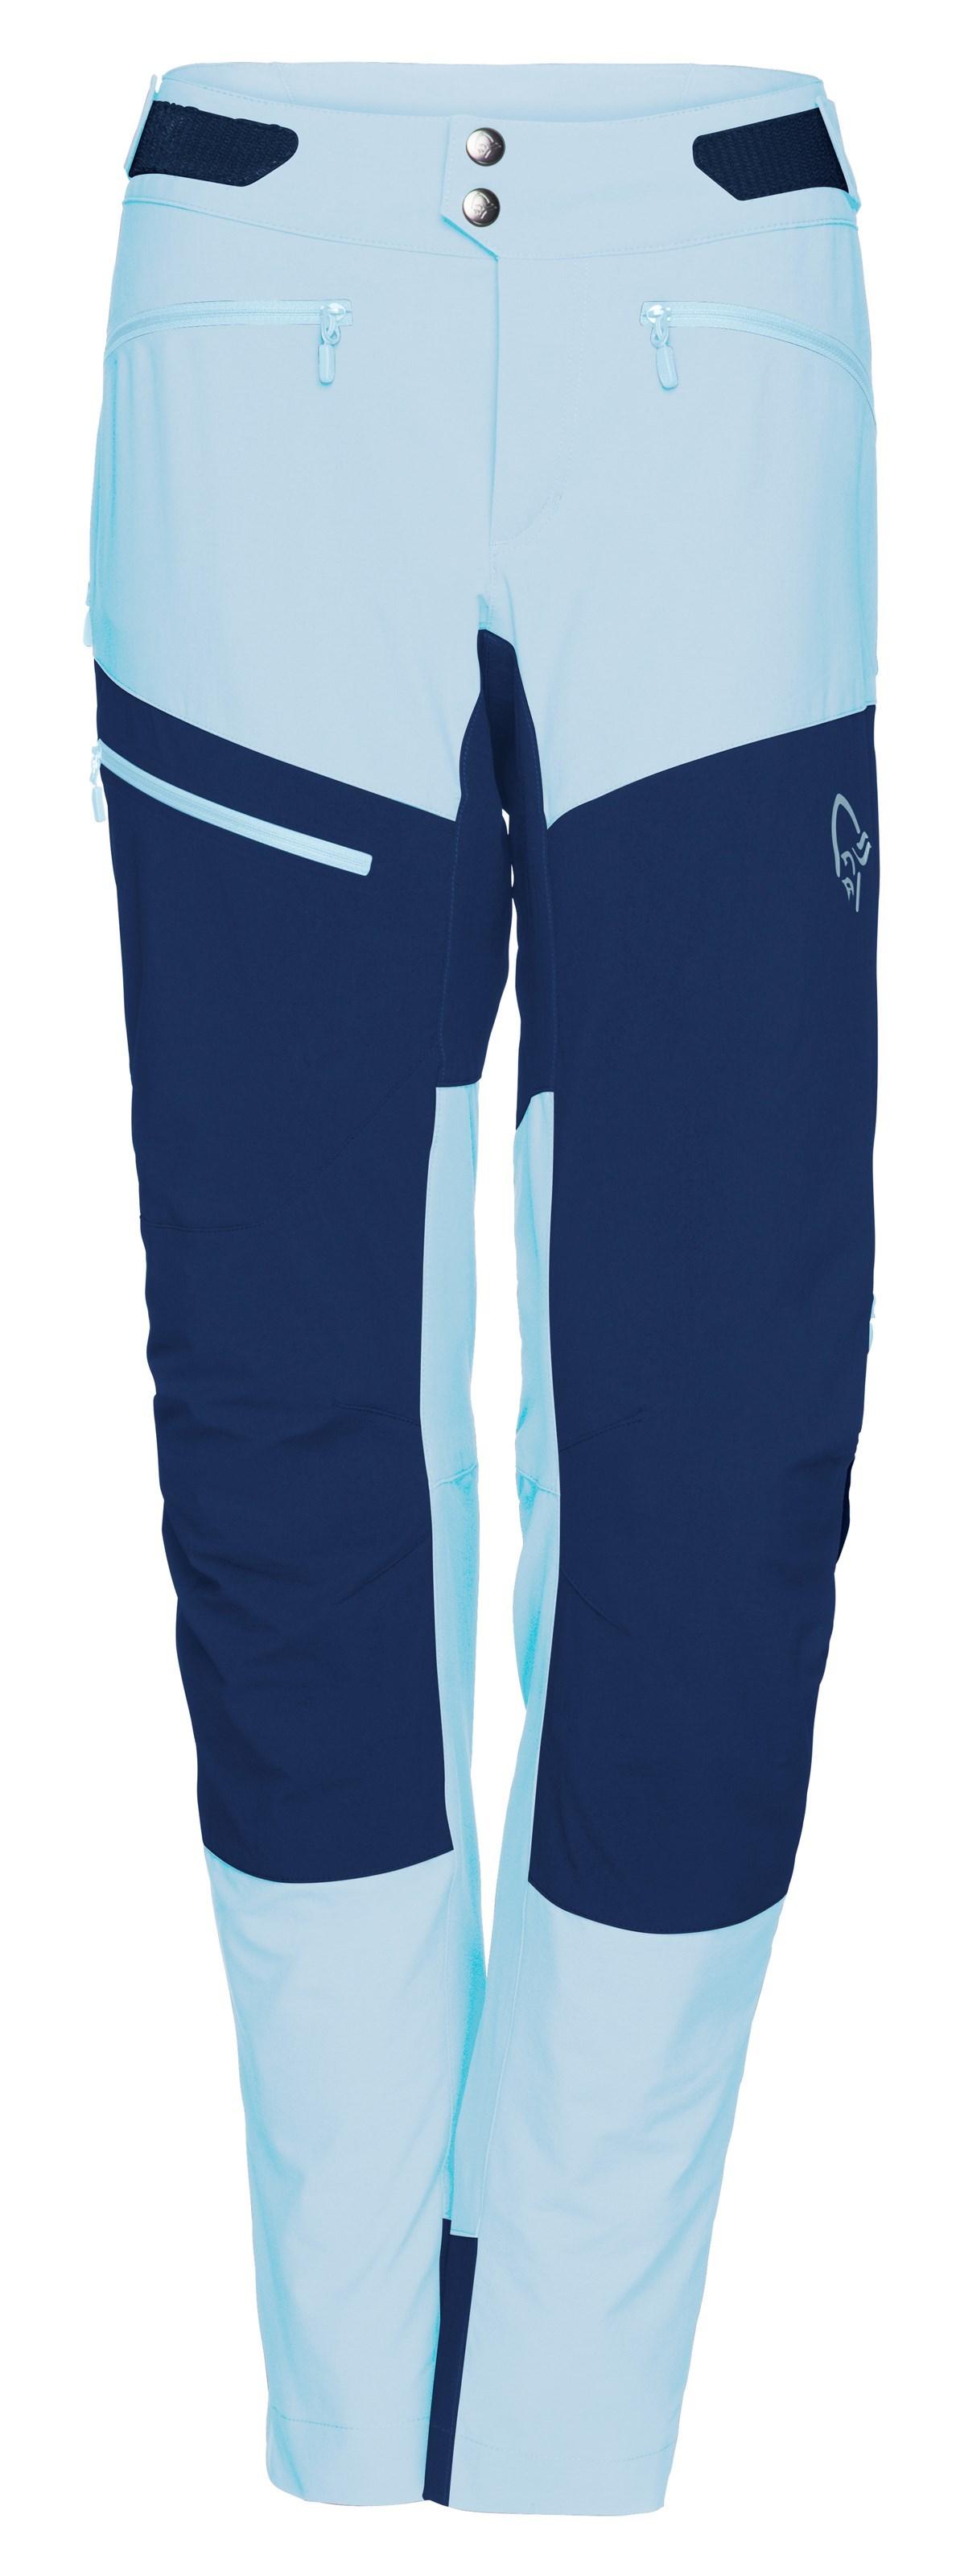 342358a5 Bilde: Norrøna Fjørå flex1 Pants, softshellbukse dame - Trick Blue/Indigo  2224- ...